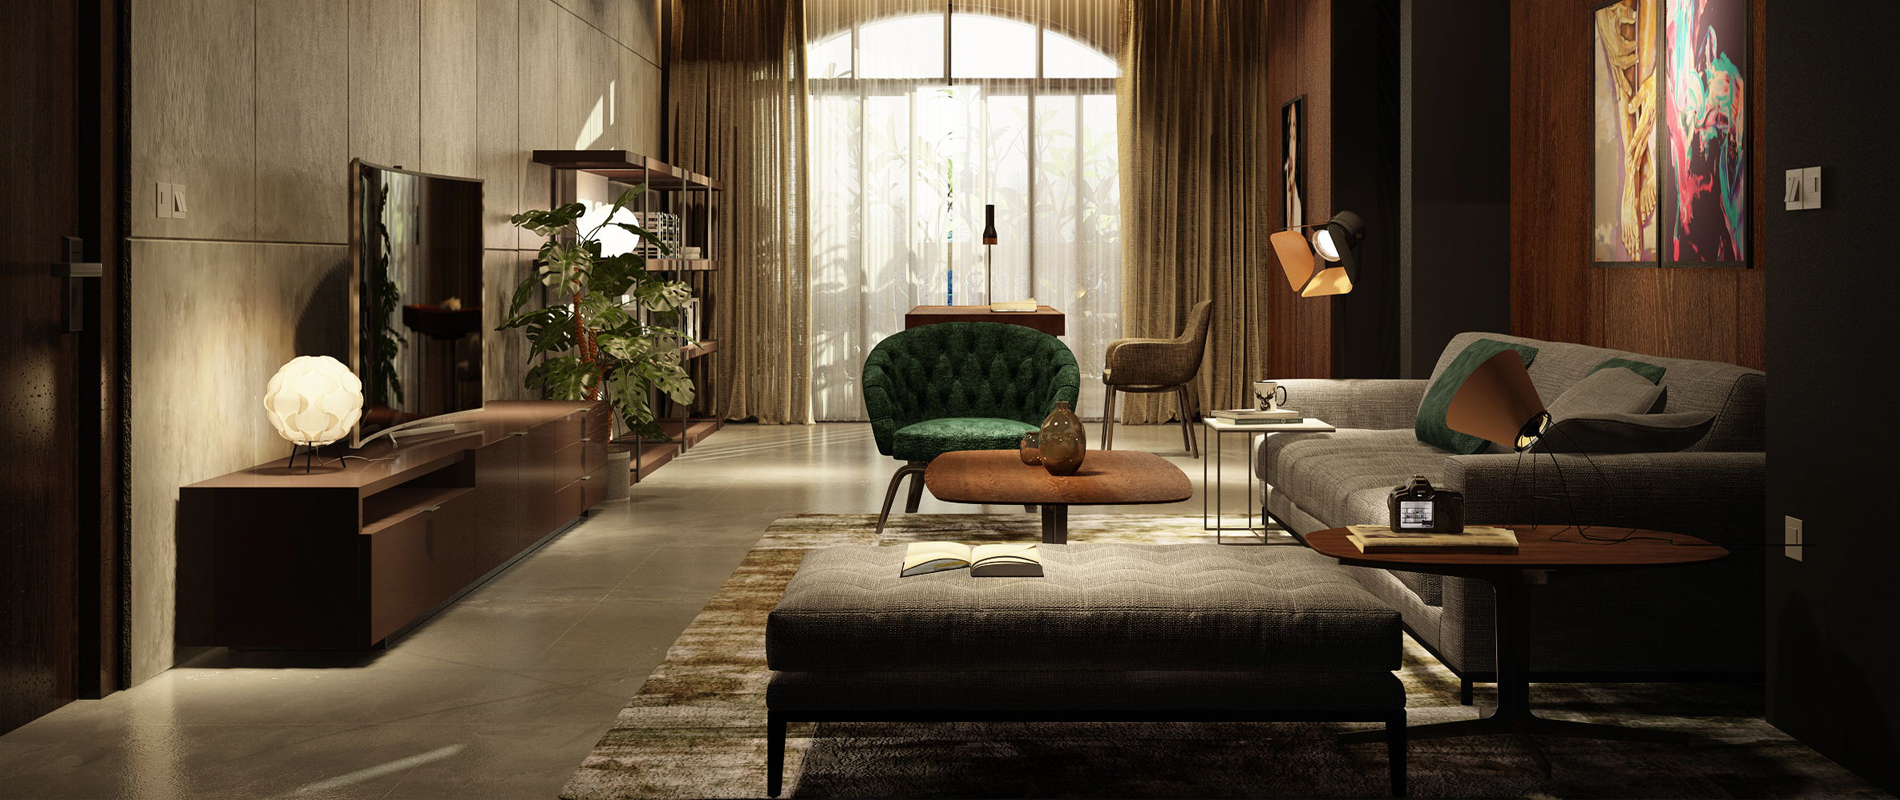 lemotifs - home interior design - thiết kế nội thất